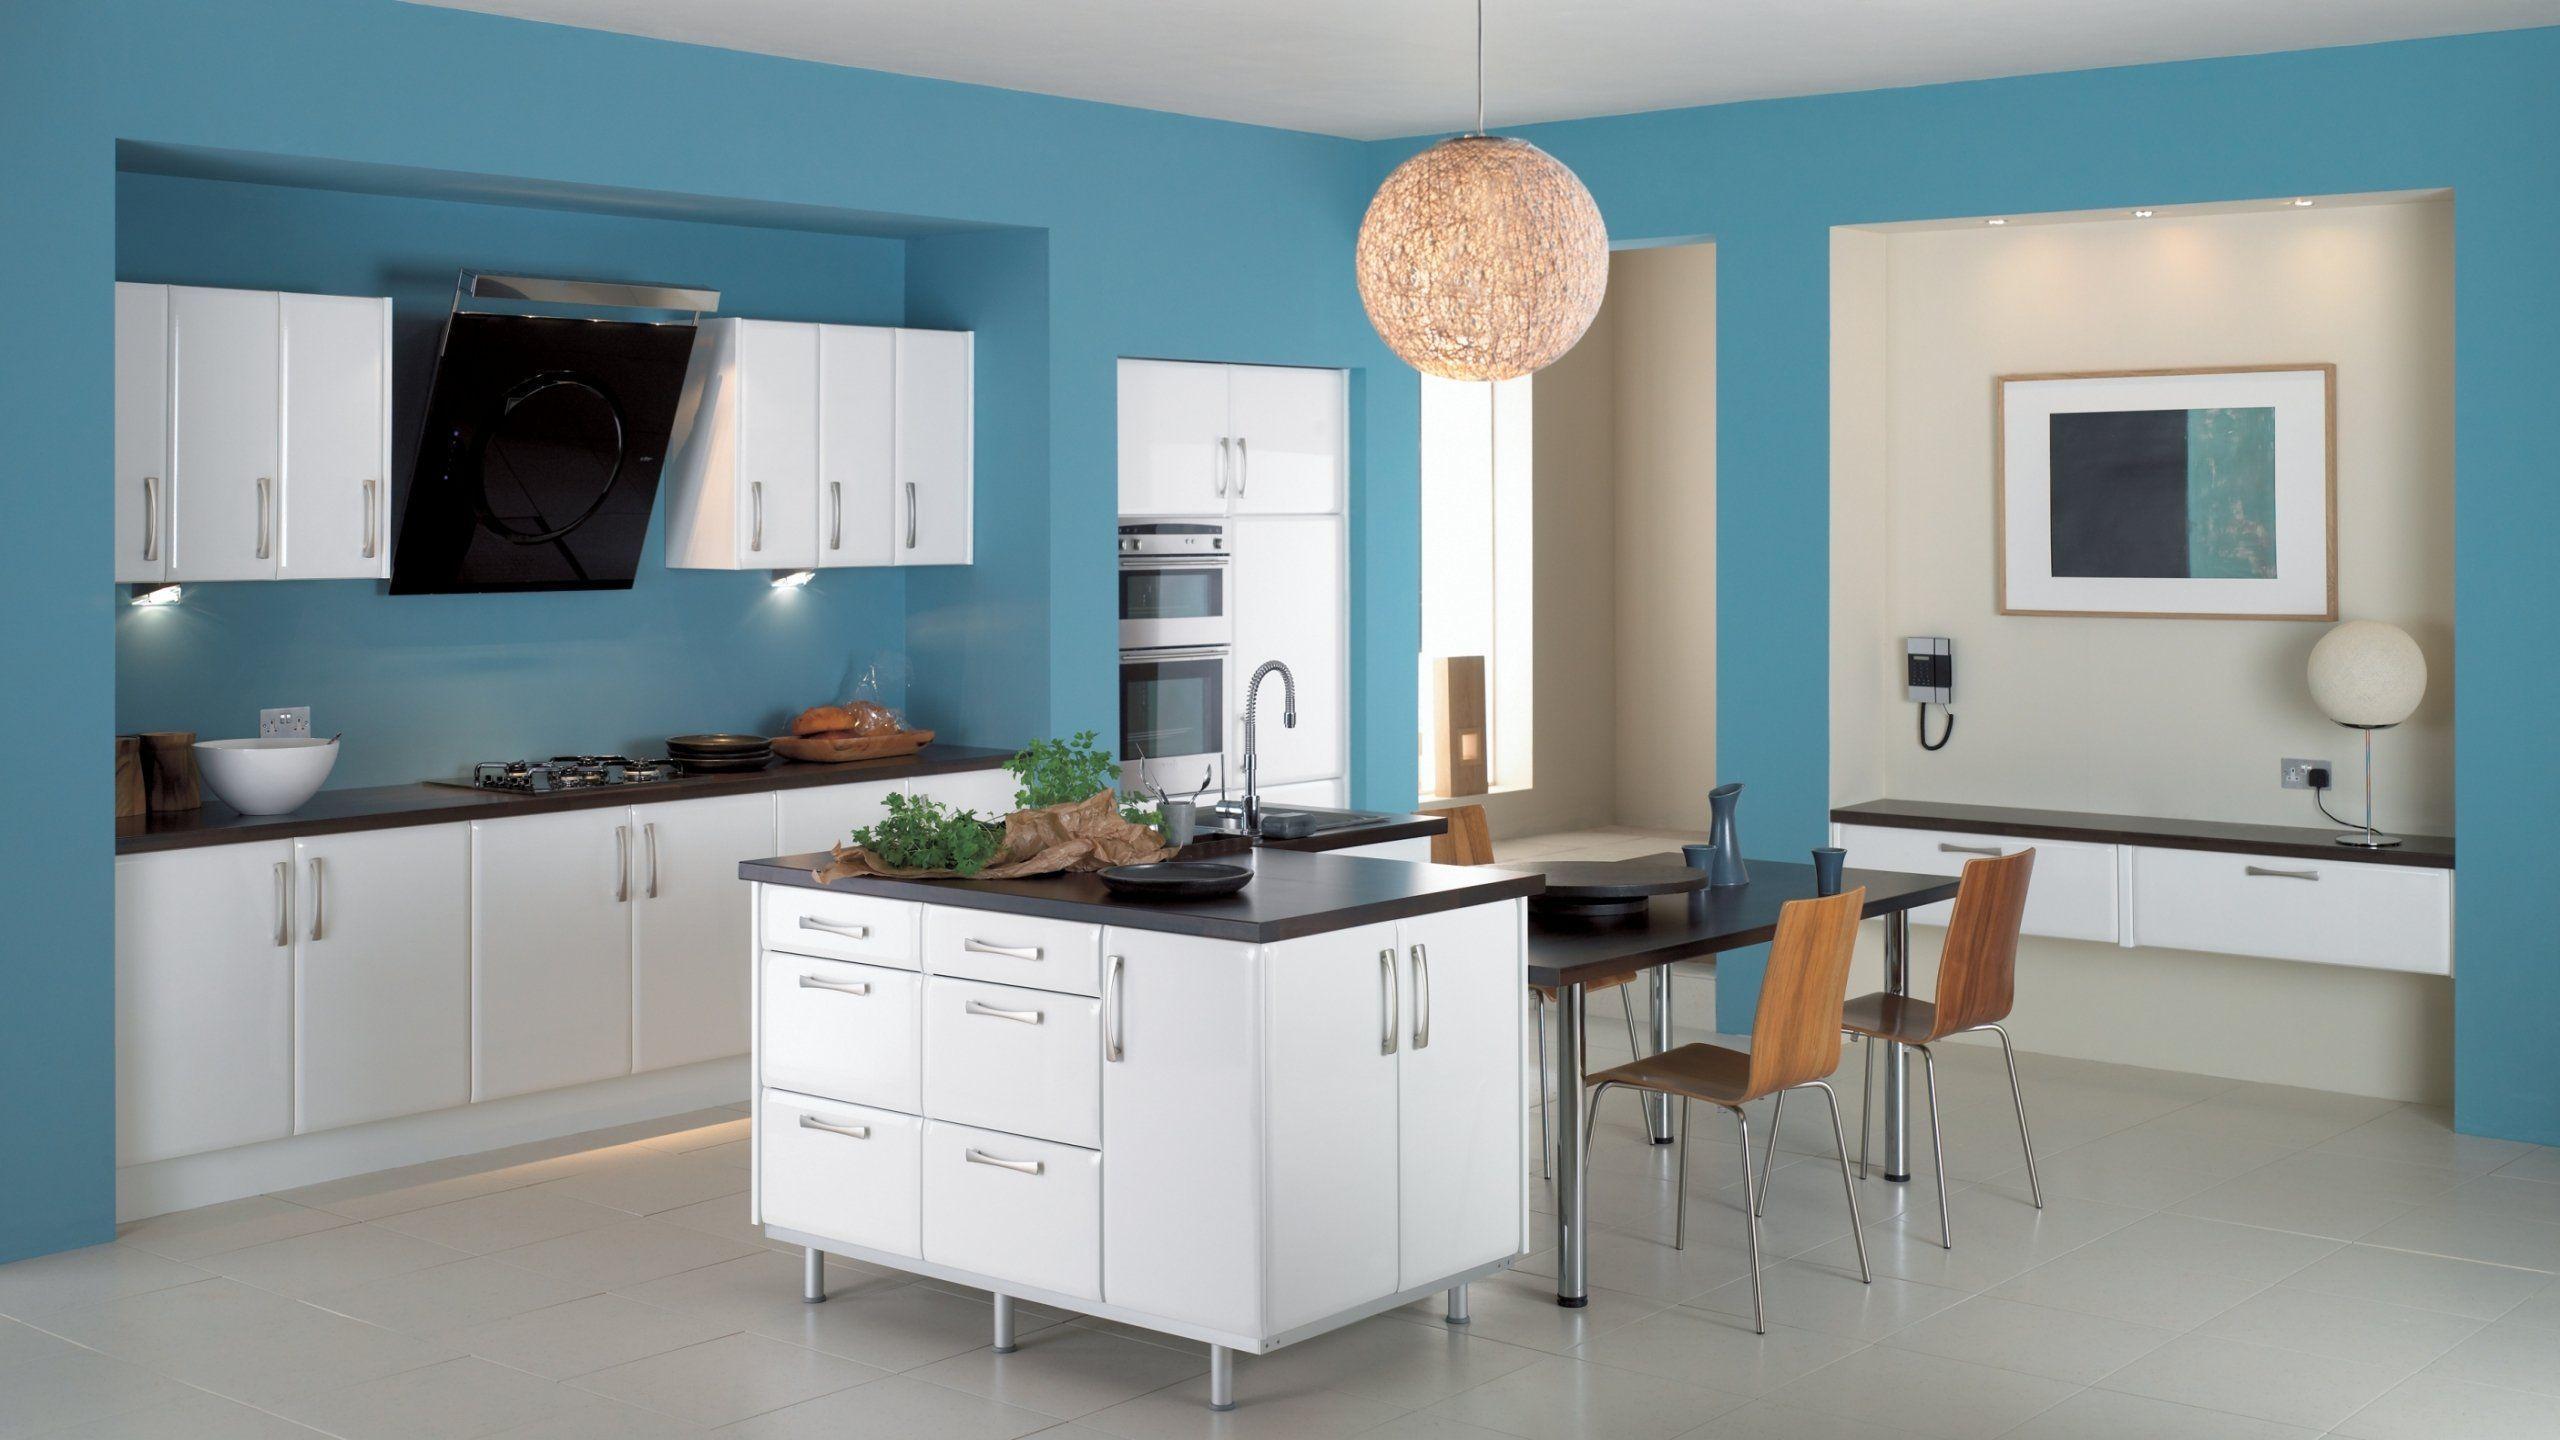 wallpapered kitchen hd